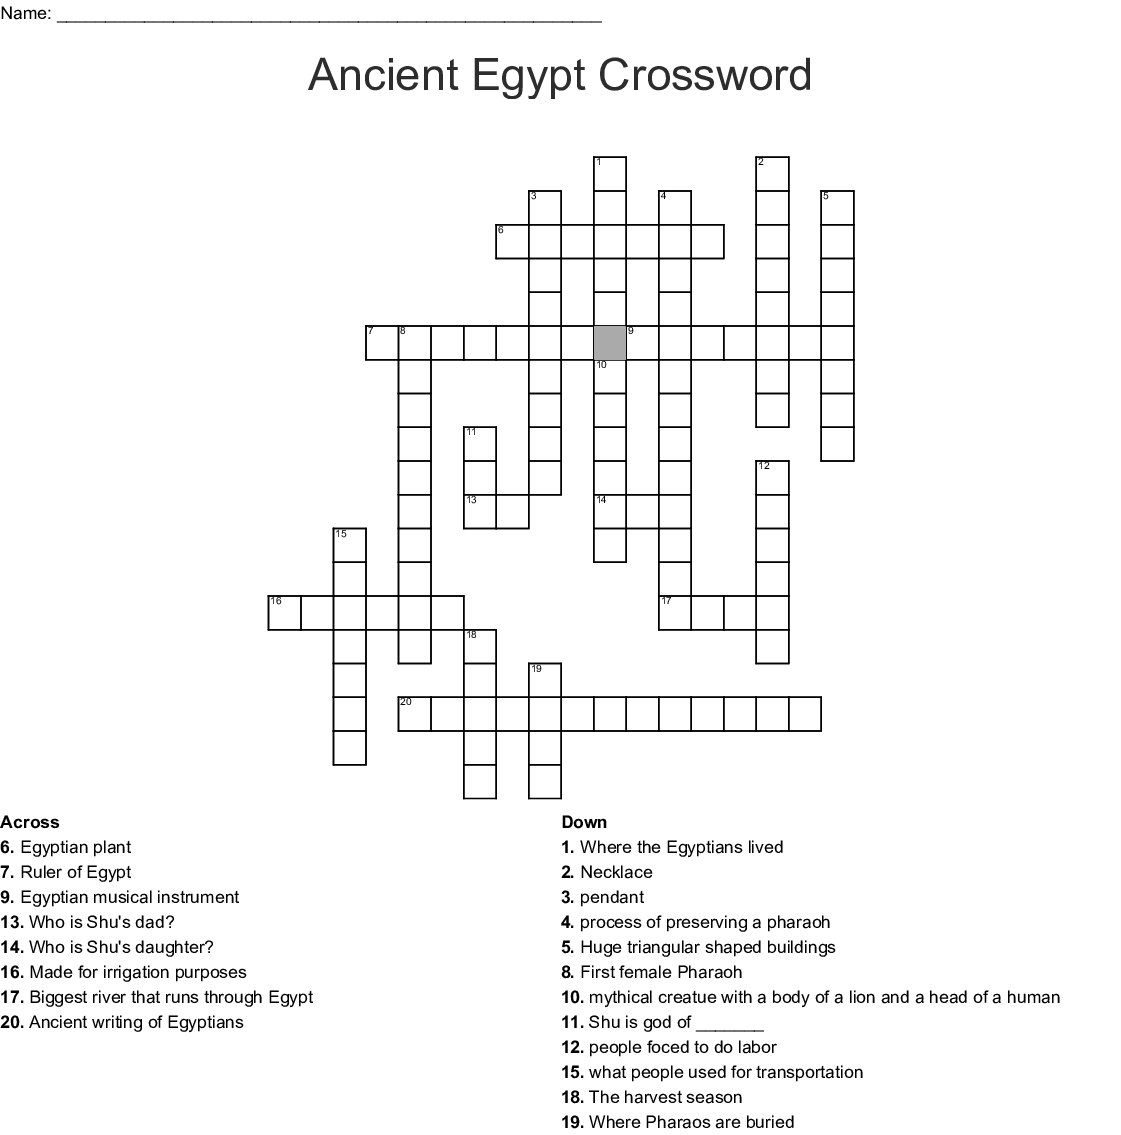 egypt project crossword puzzle - WordMint